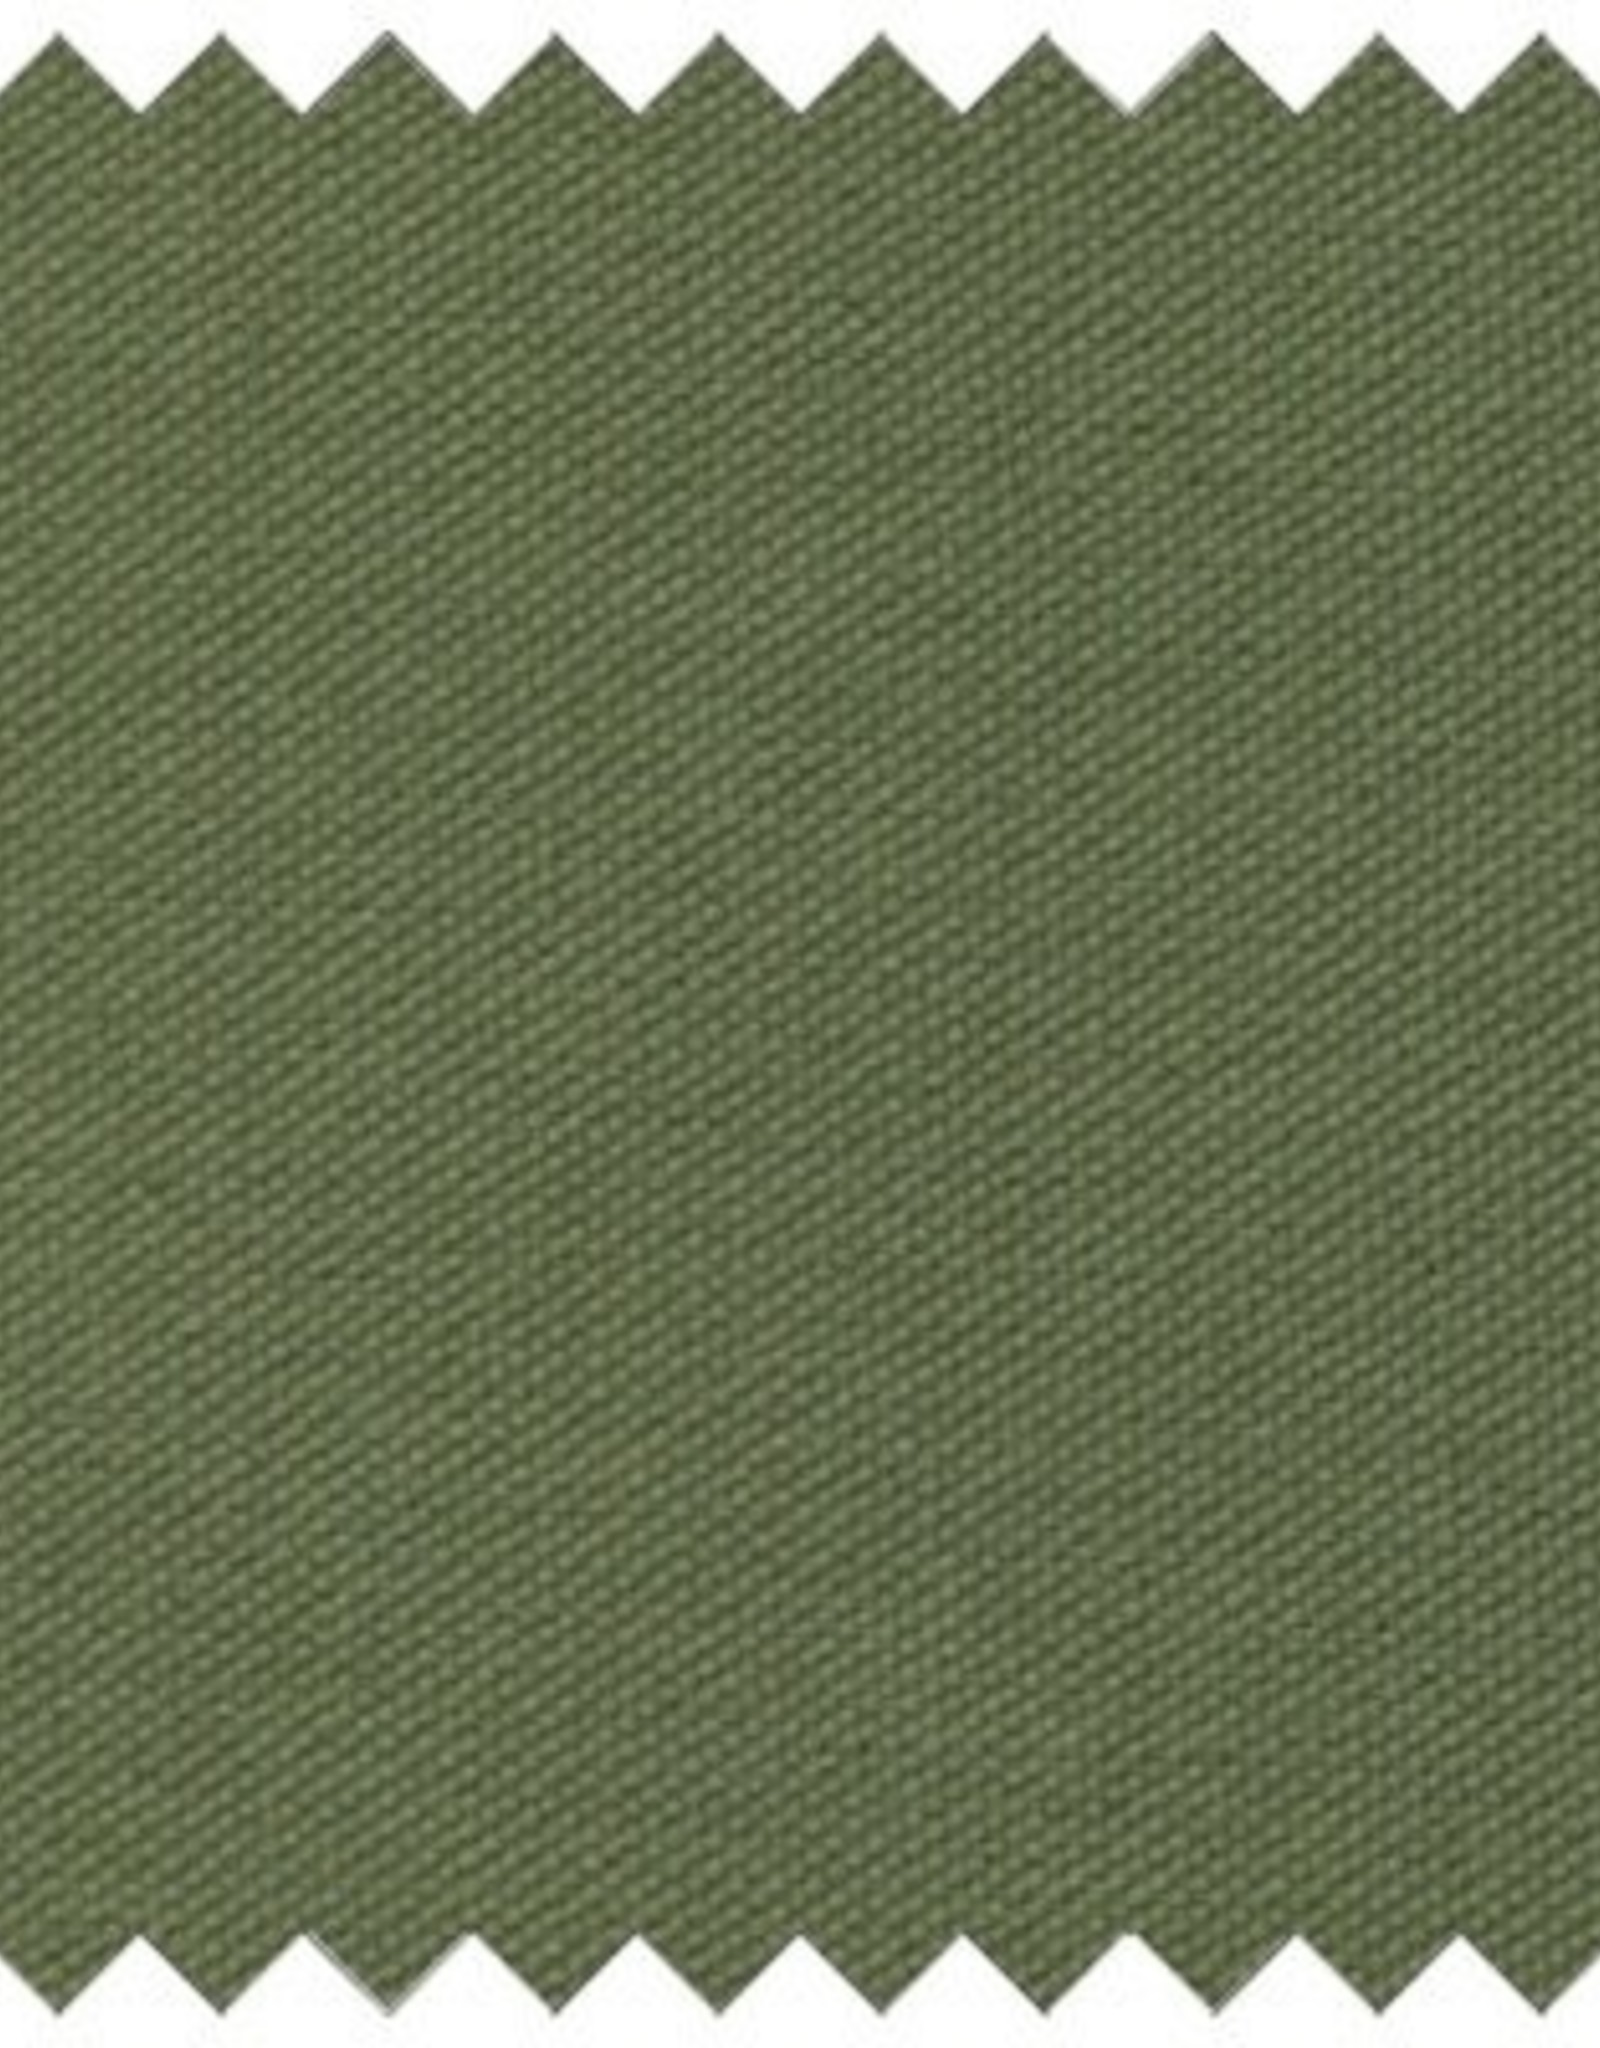 Carolina Morning Designs Buckwheat Zafu - Organic Moss